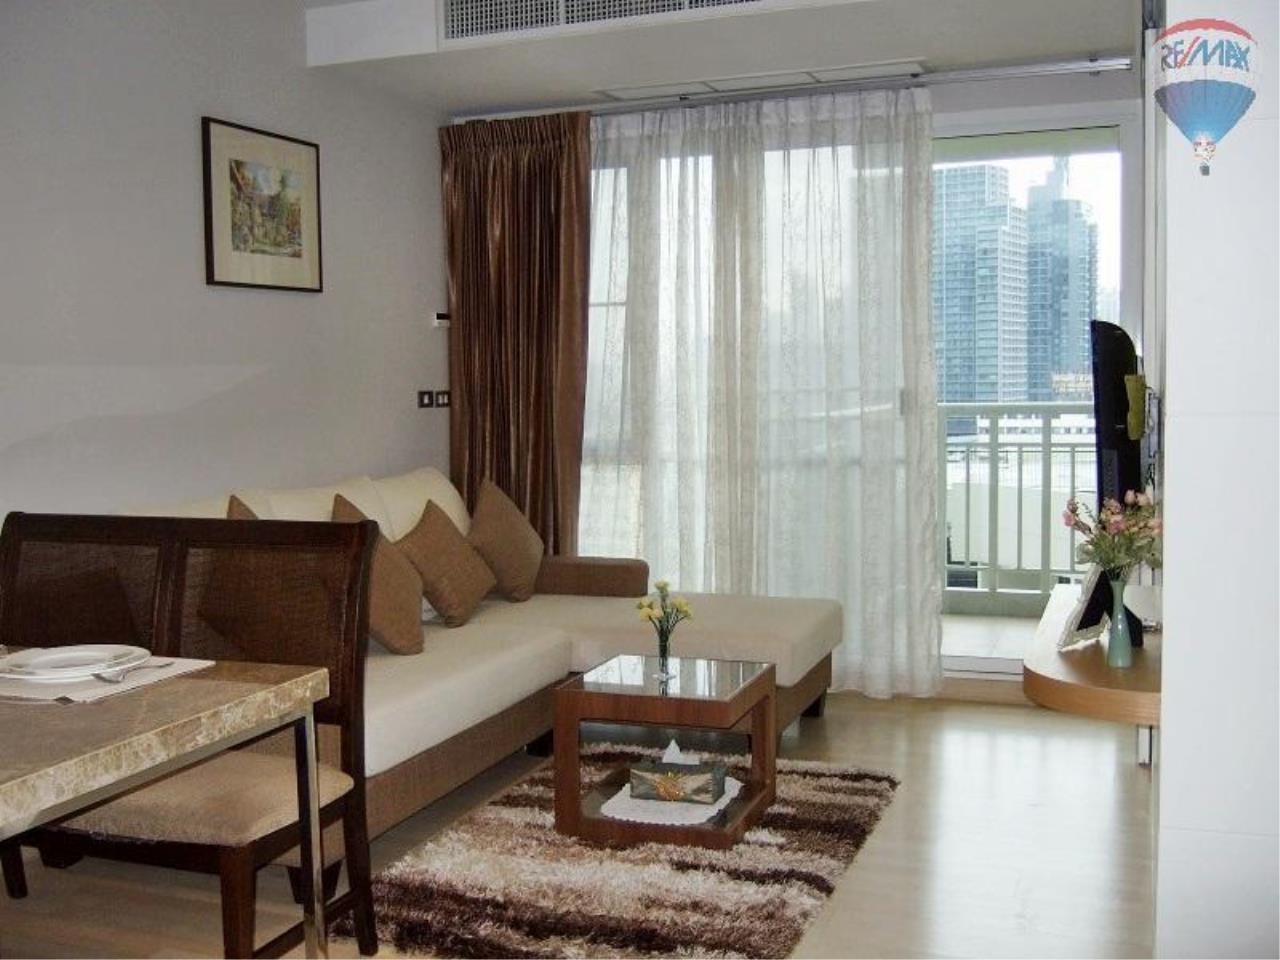 RE/MAX Properties Agency's Condominium for rent 2 bedrooms 66.17 Sq.m. at 59 Heritage 4